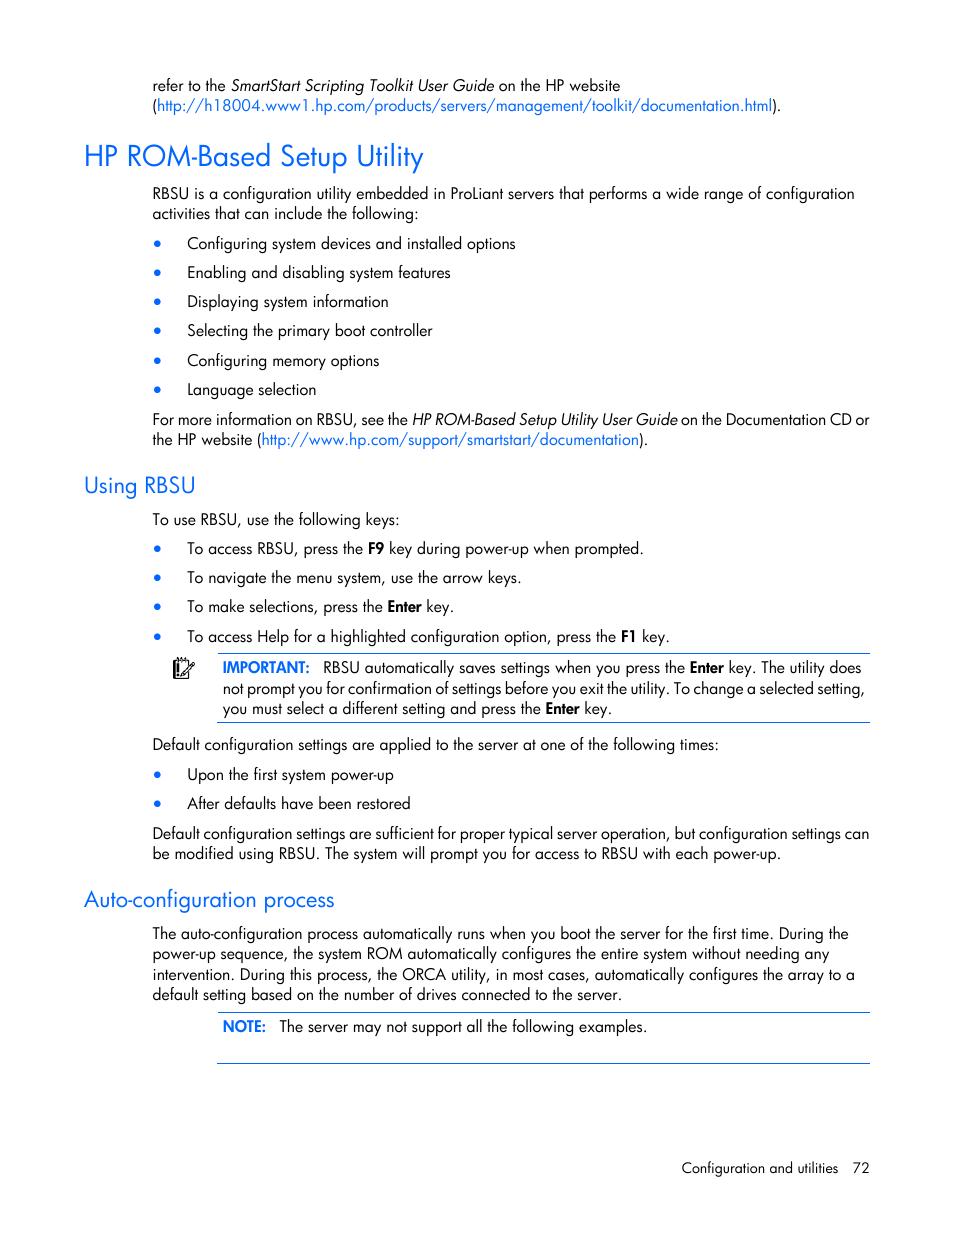 hp rom based setup utility using rbsu auto configuration process rh manualsdir com  hp smartstart scripting toolkit windows edition user guide